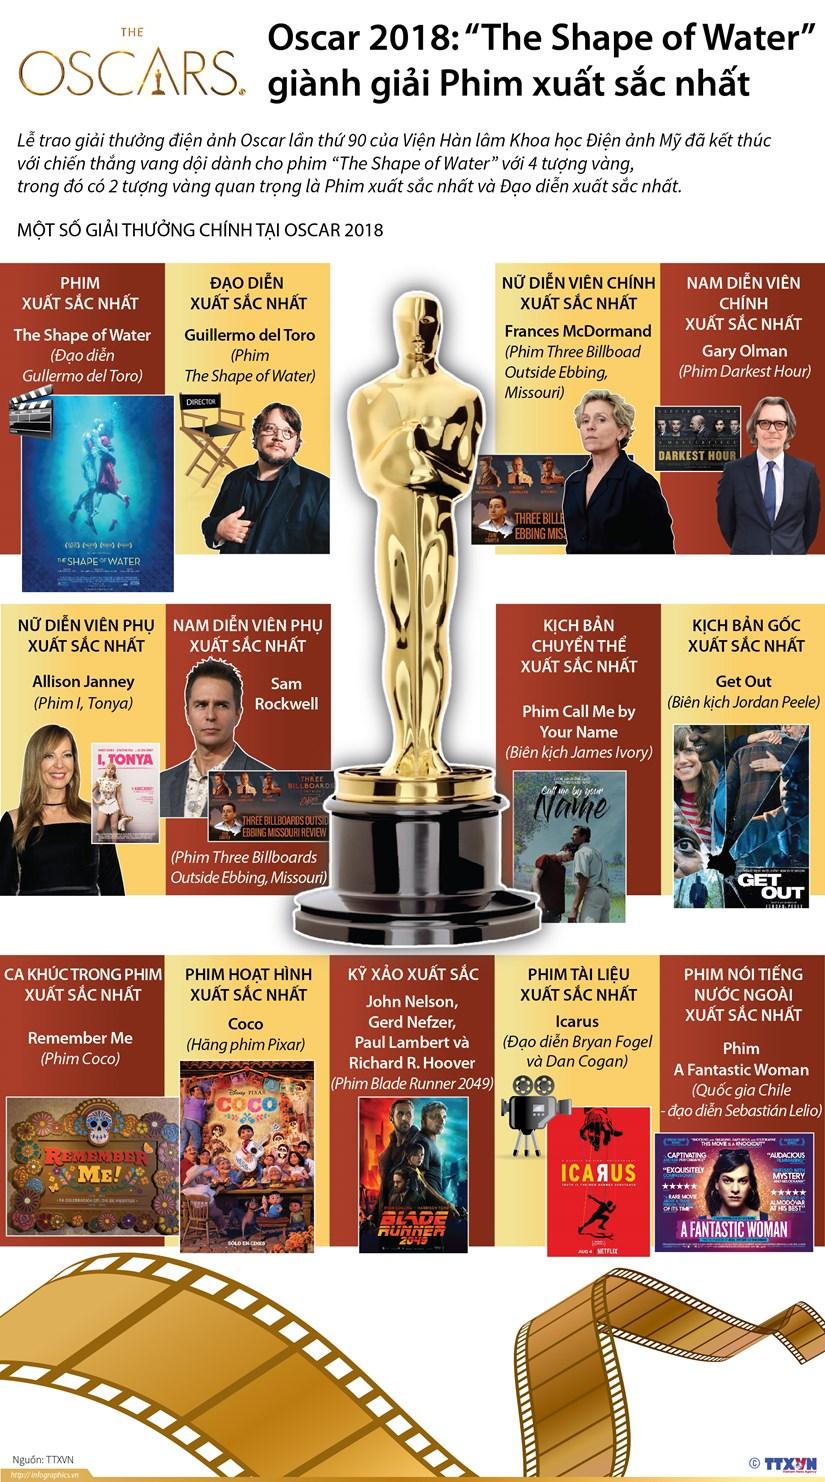 [Infographics] Cac hang muc chinh tai giai Oscar lan thu 90 hinh anh 1